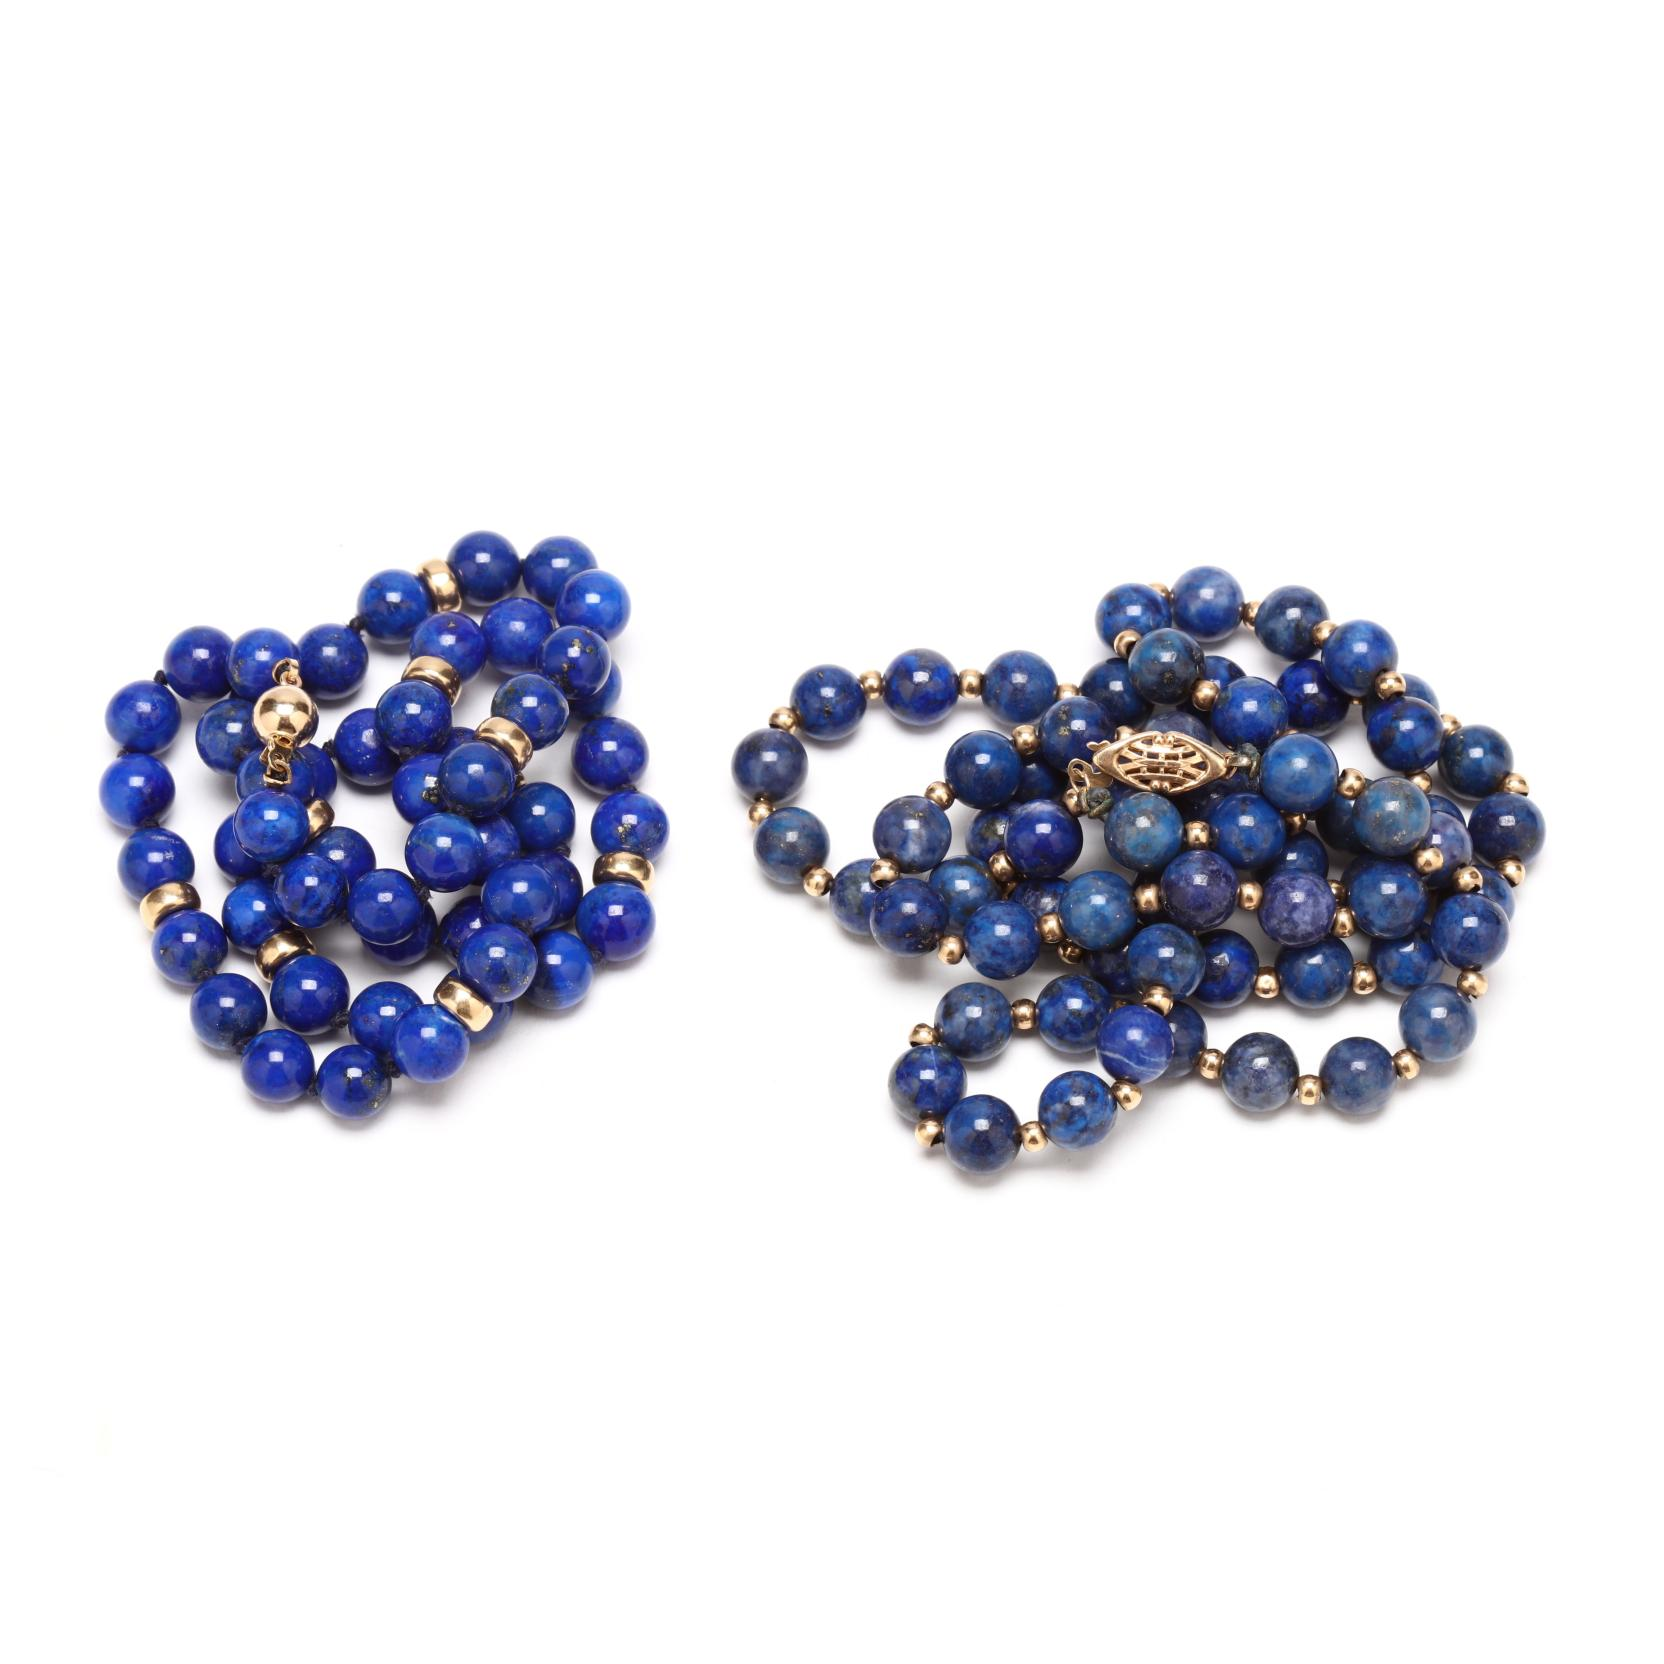 two-lapis-lazuli-bead-necklaces